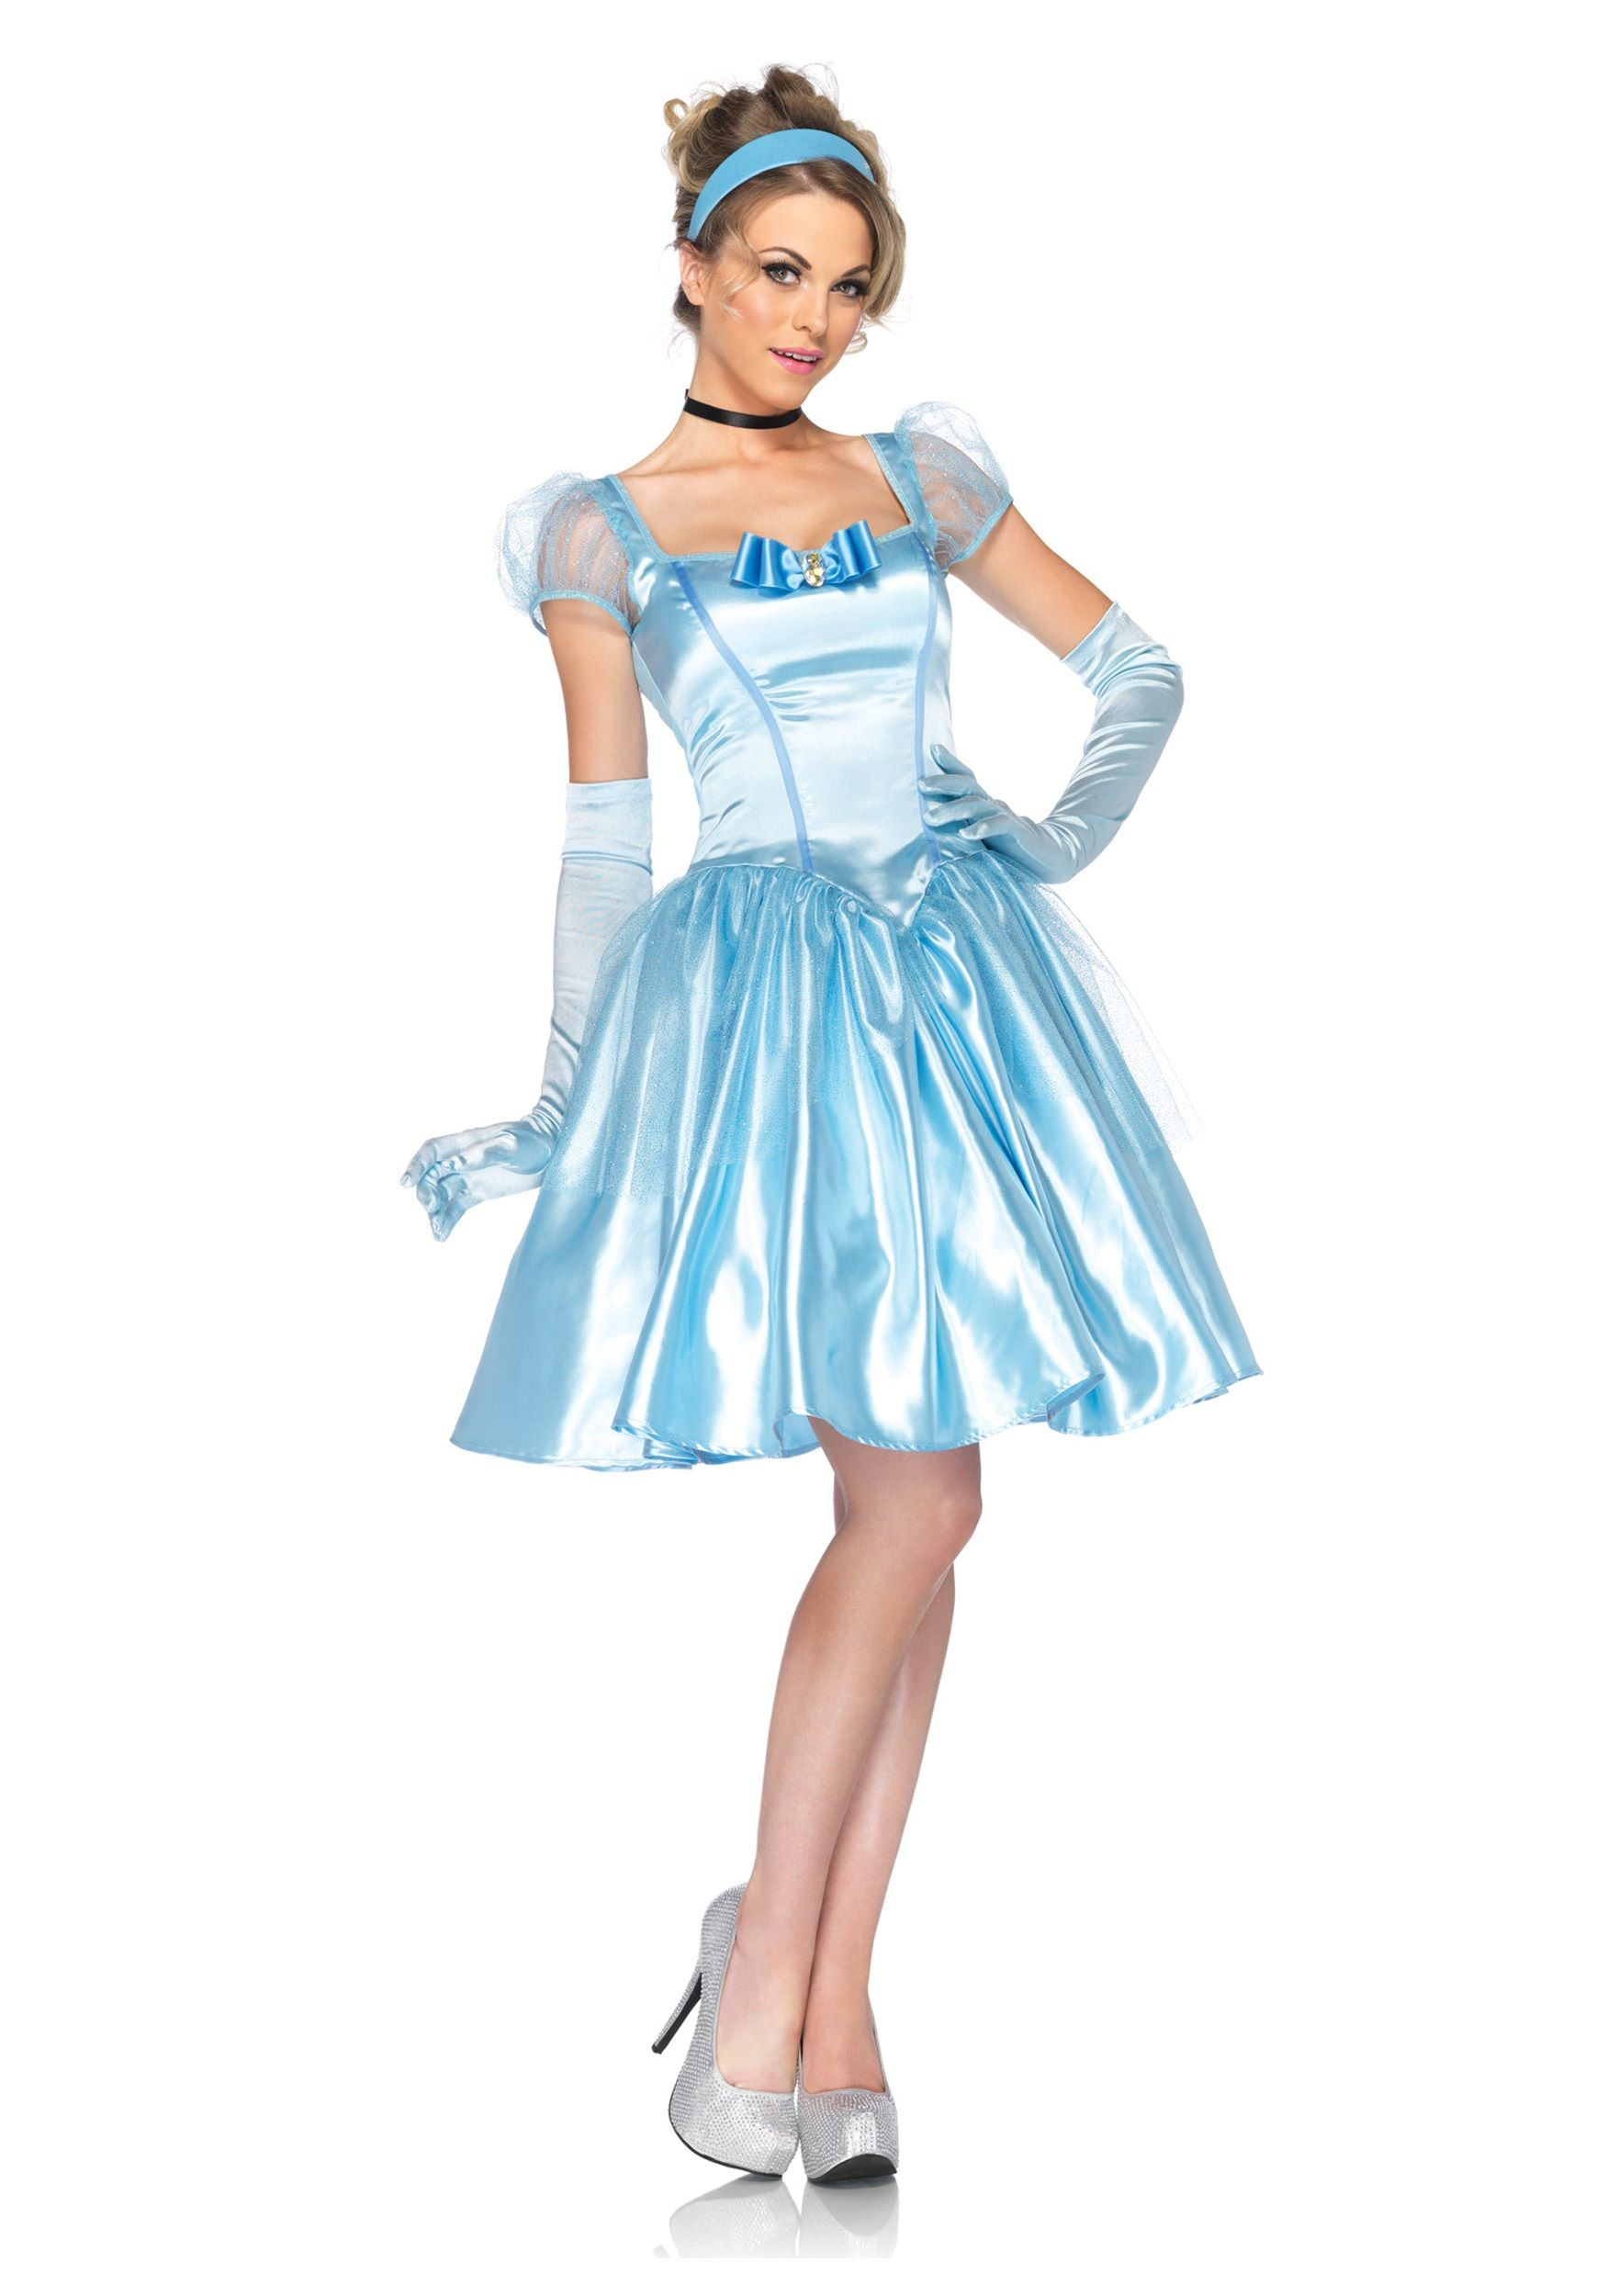 Disney Costumes For Adults Plus Size | Plus Size Disney ...